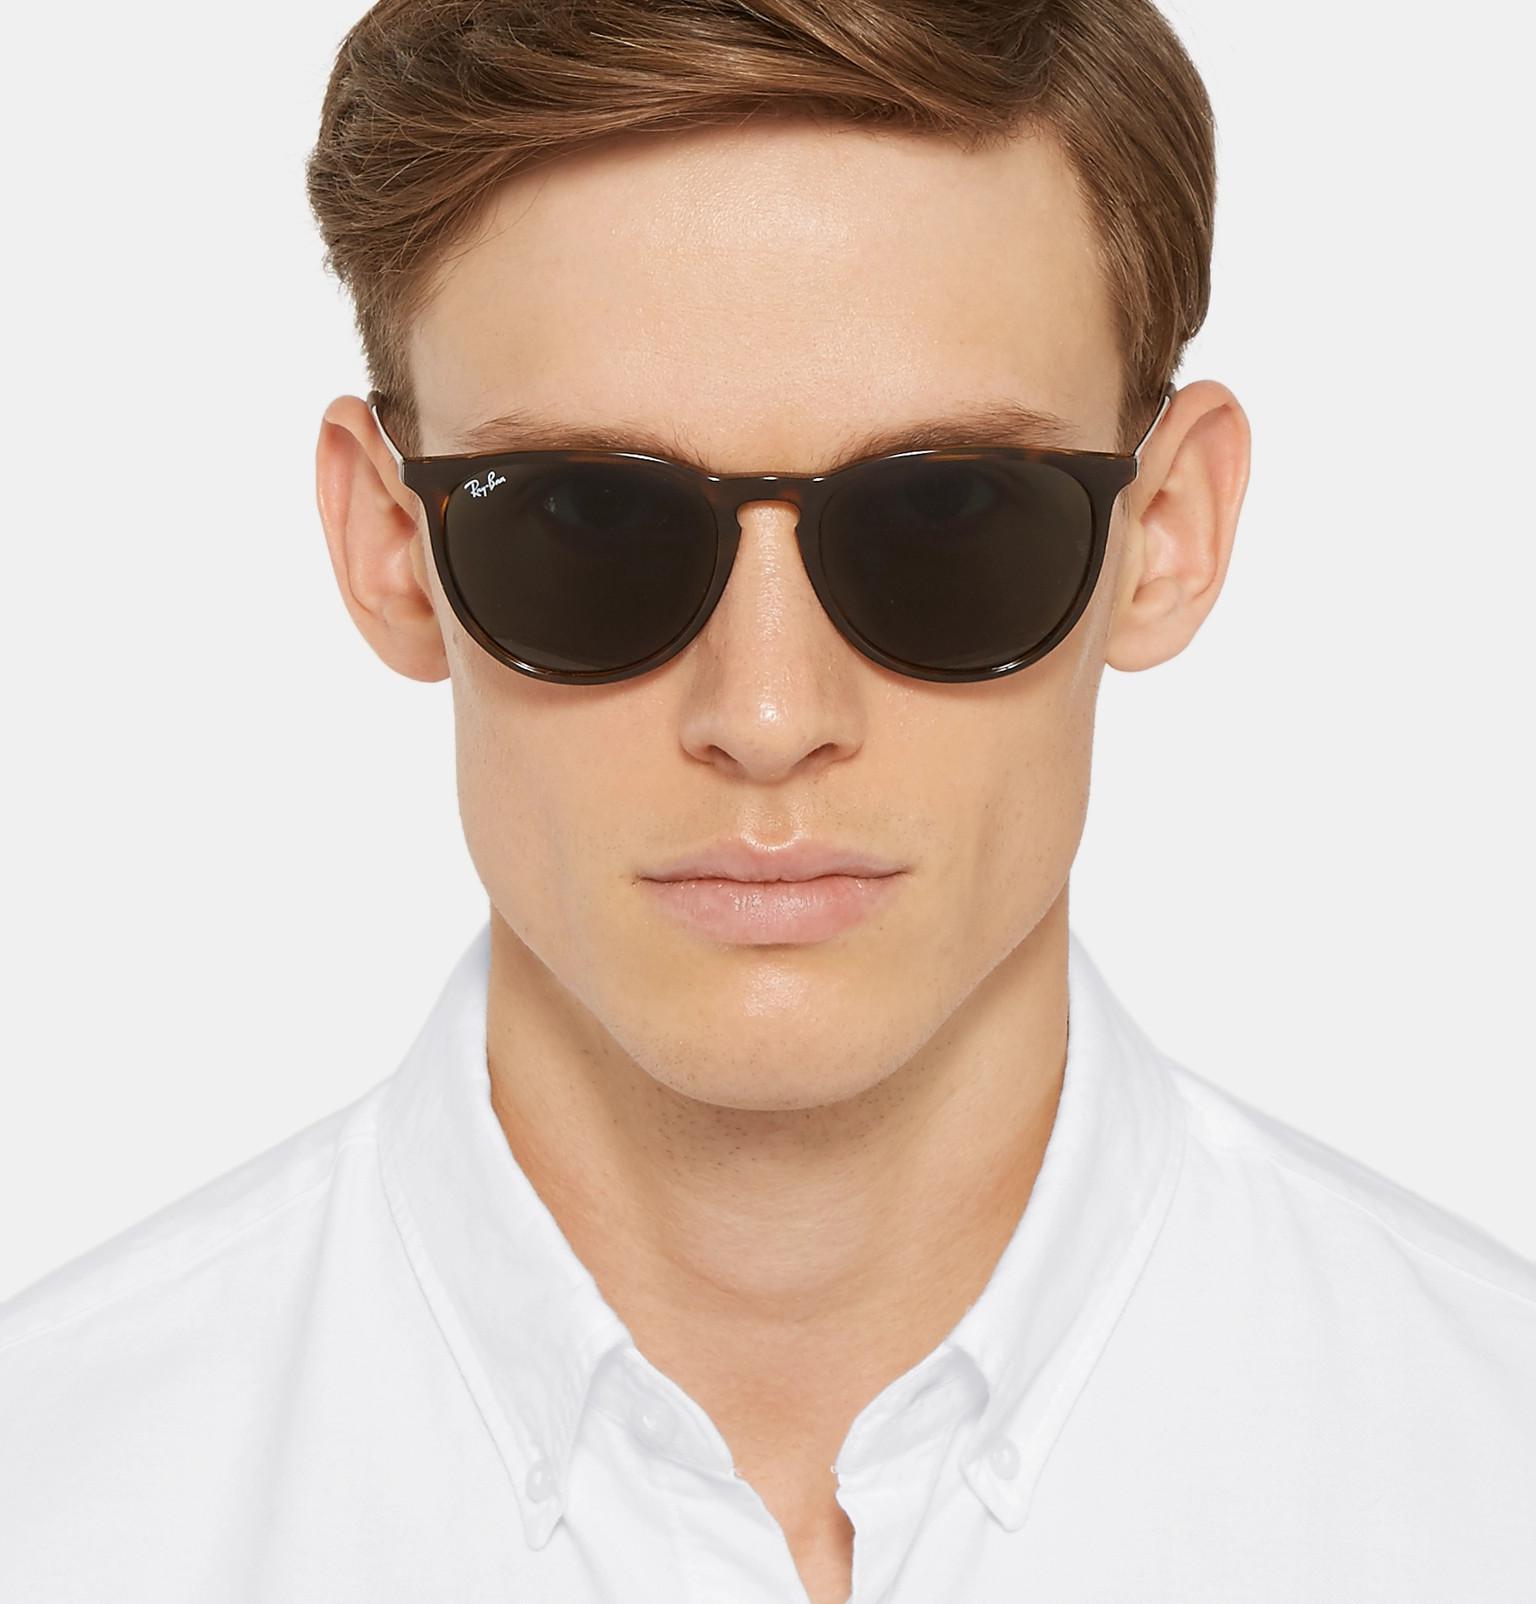 c2c07dfc42 Ray-Ban - Brown Erika Round-frame Tortoiseshell Acetate Sunglasses for Men  - Lyst. View fullscreen